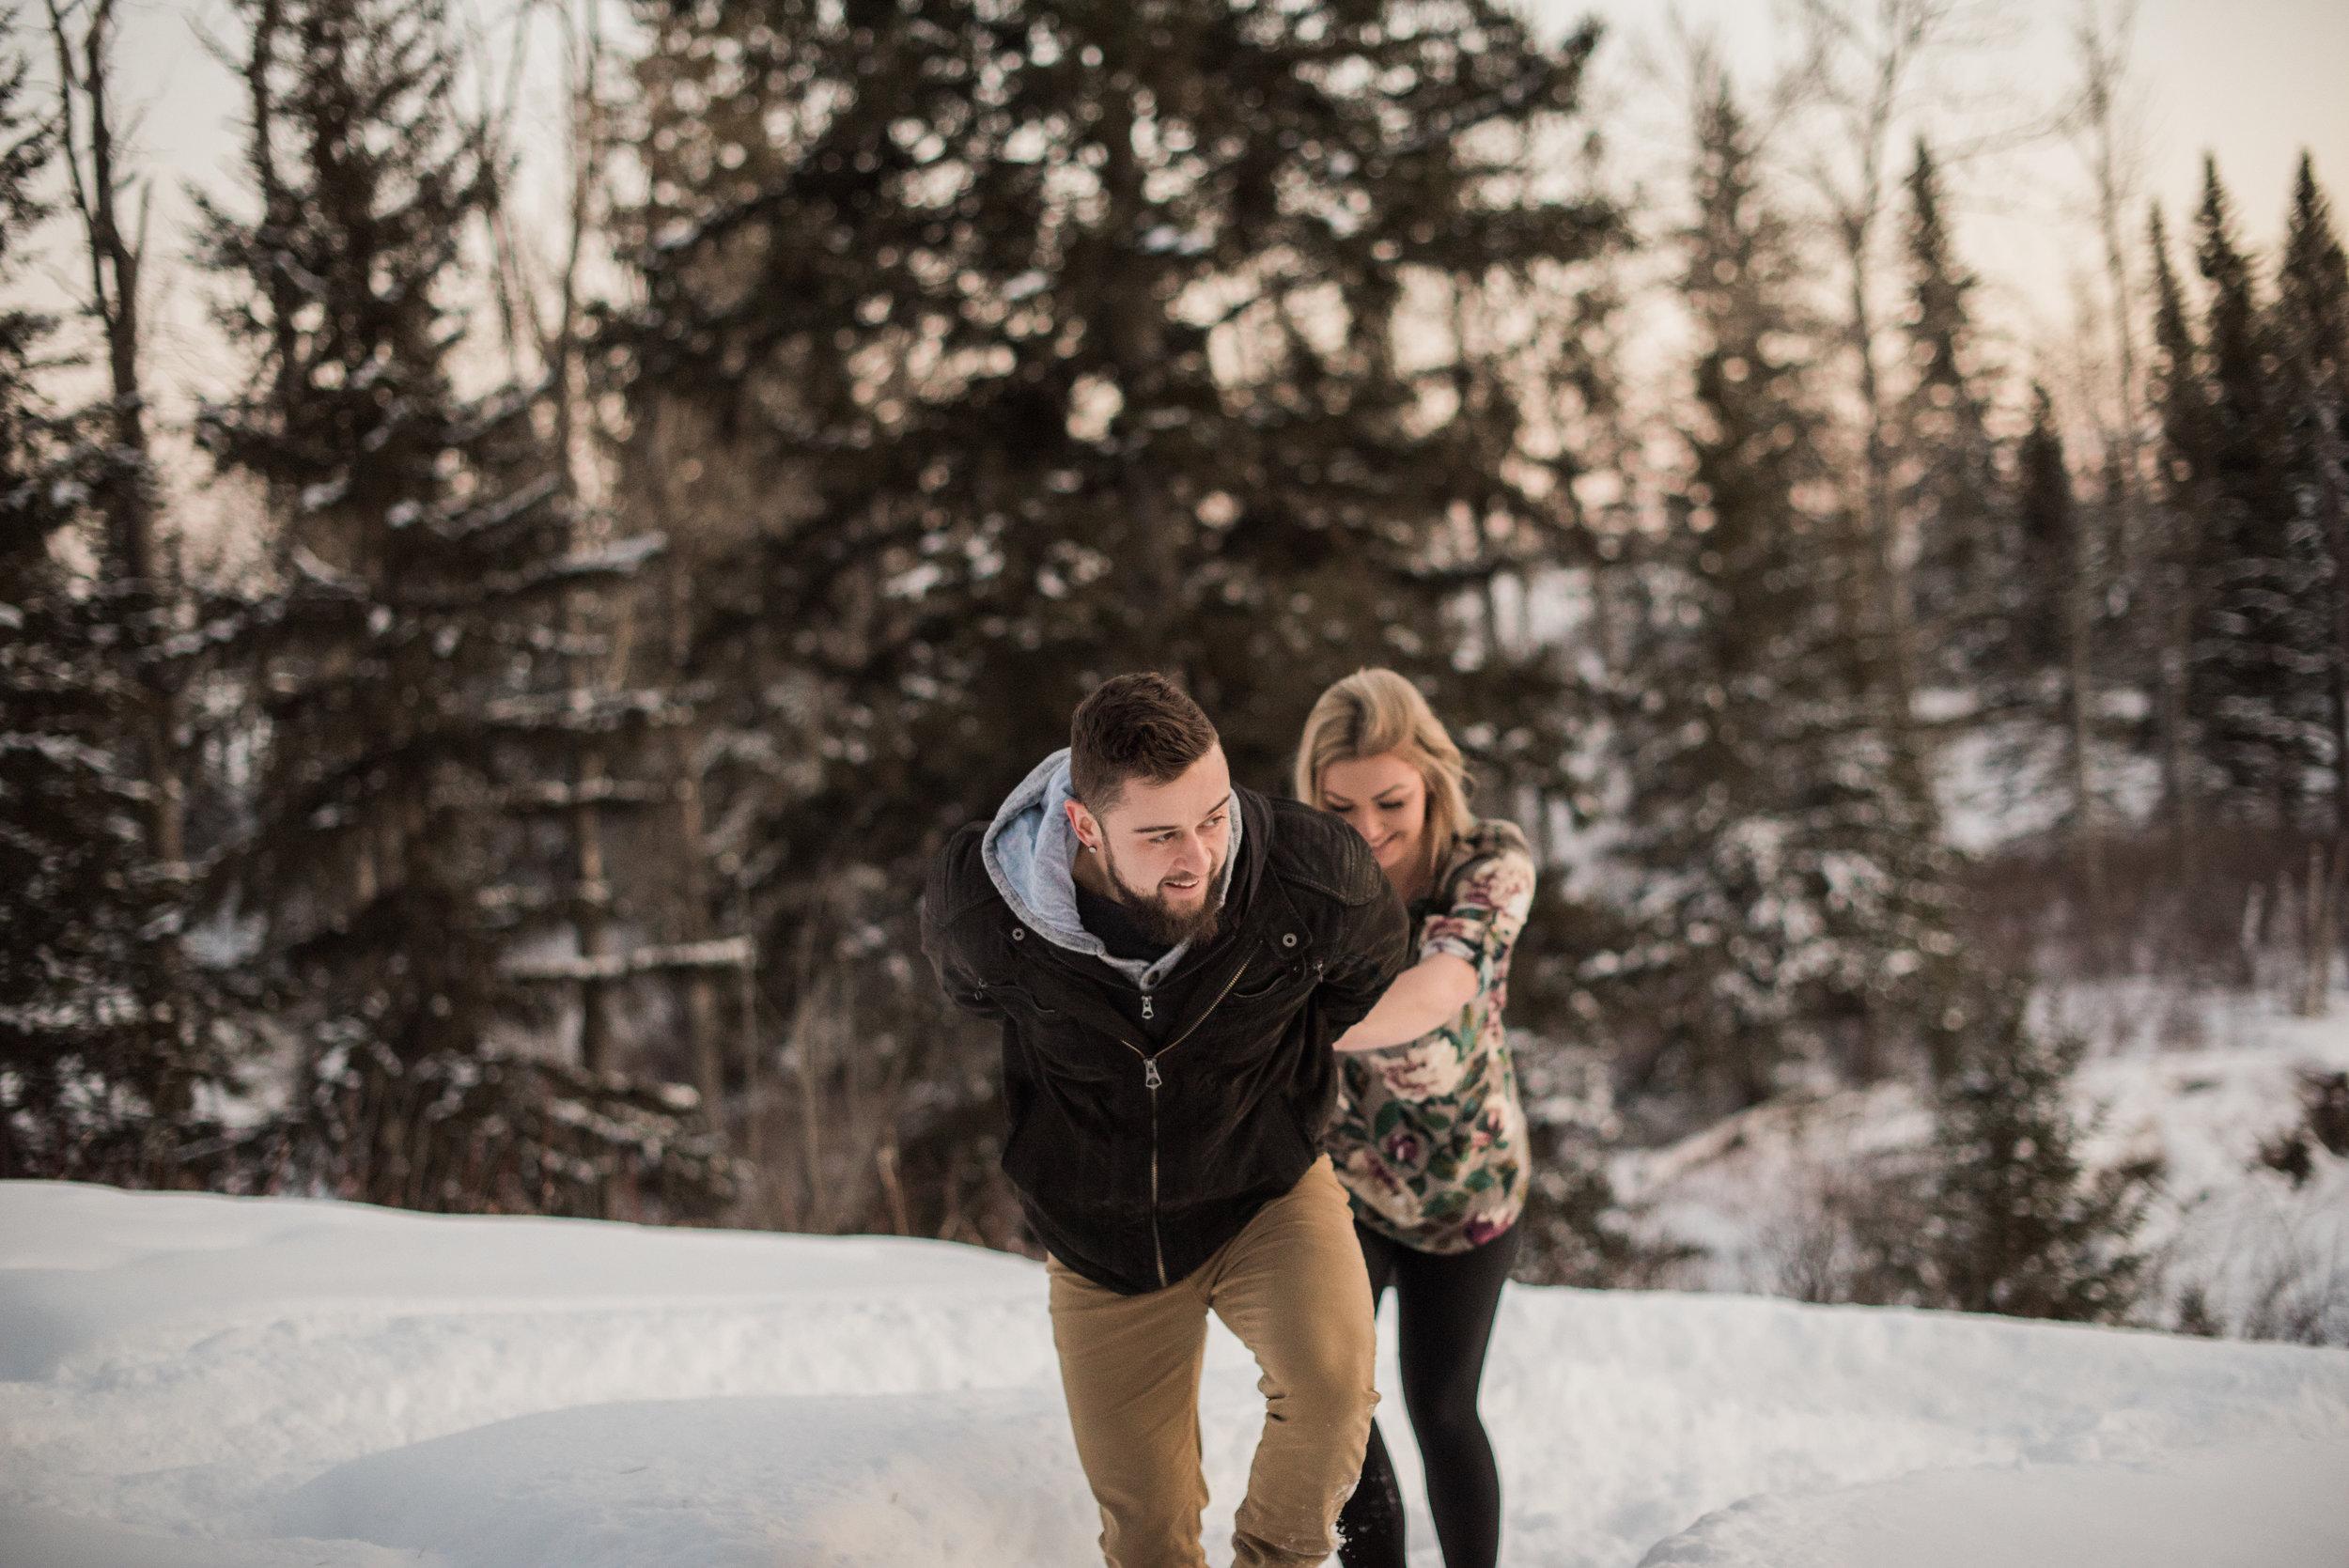 Winter Engagement Session | Edmonton Alberta | Rockwood Photography